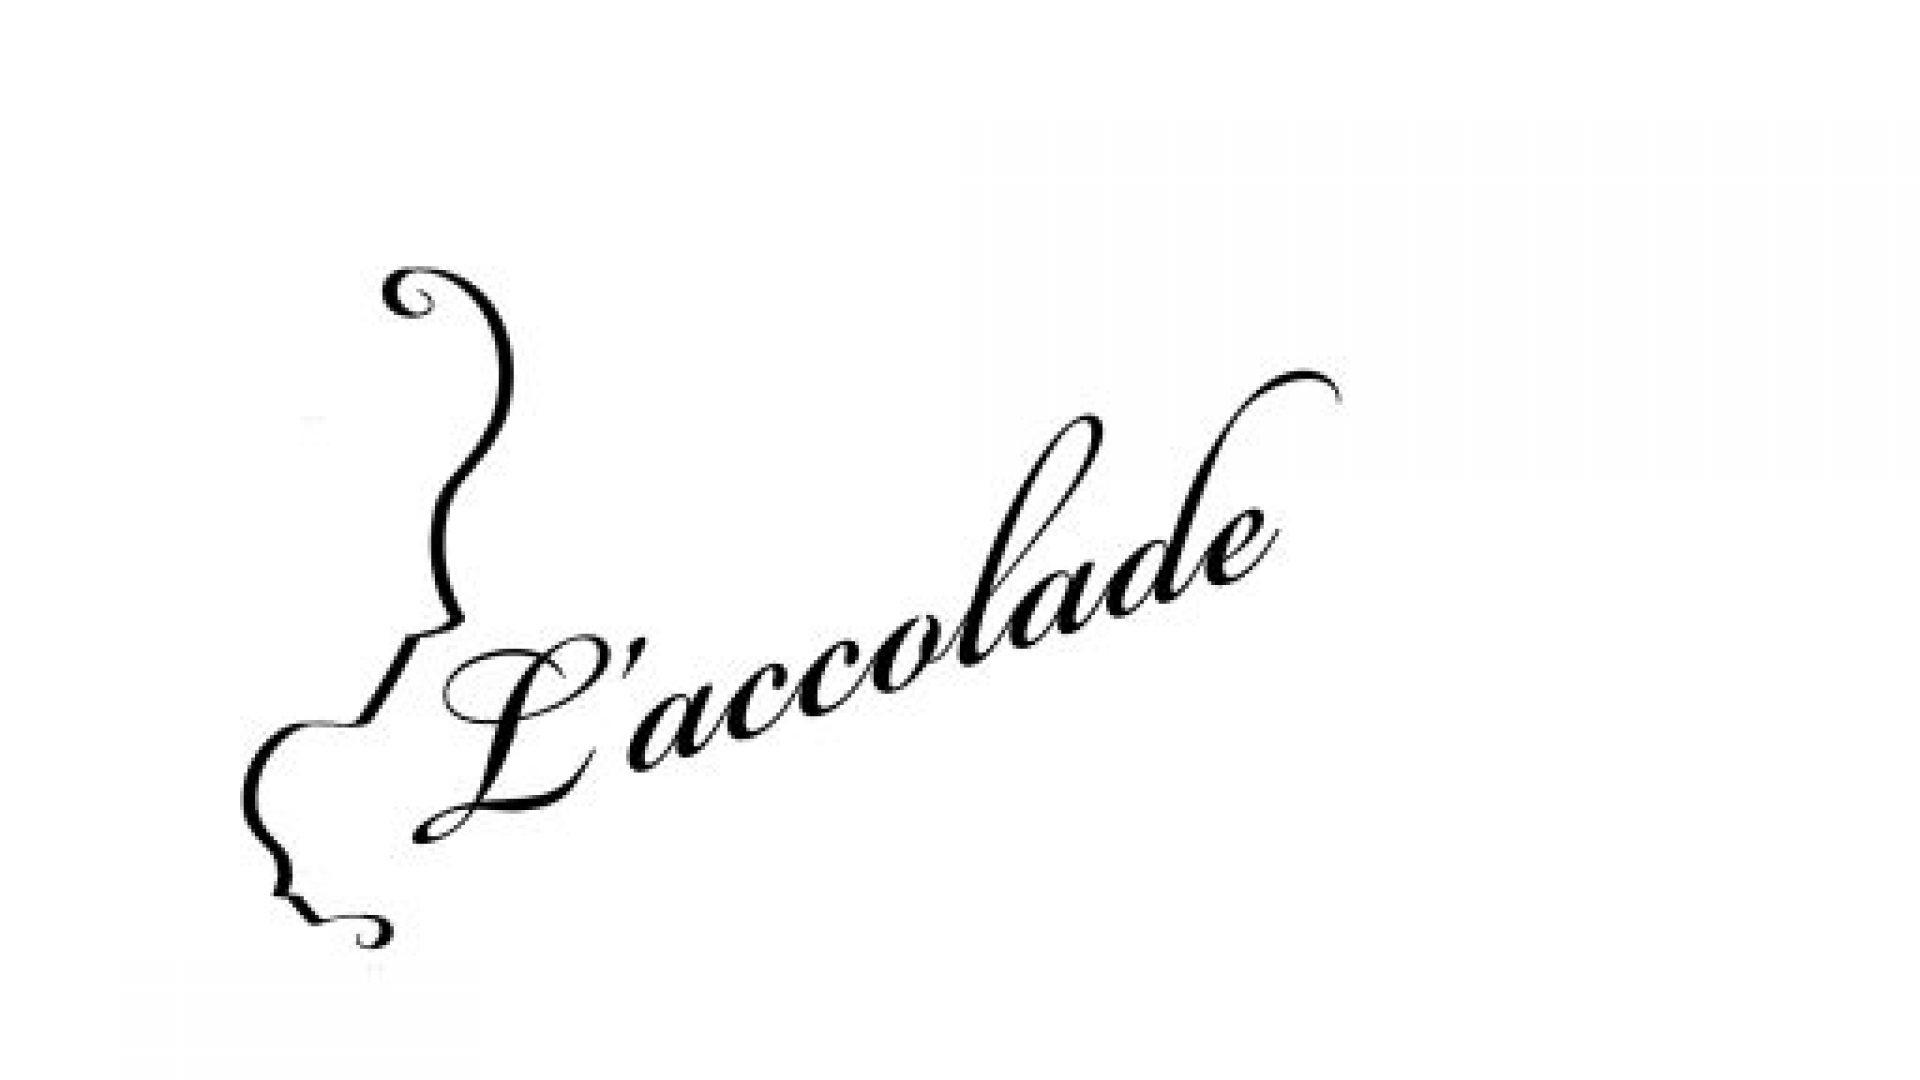 L'Accolade